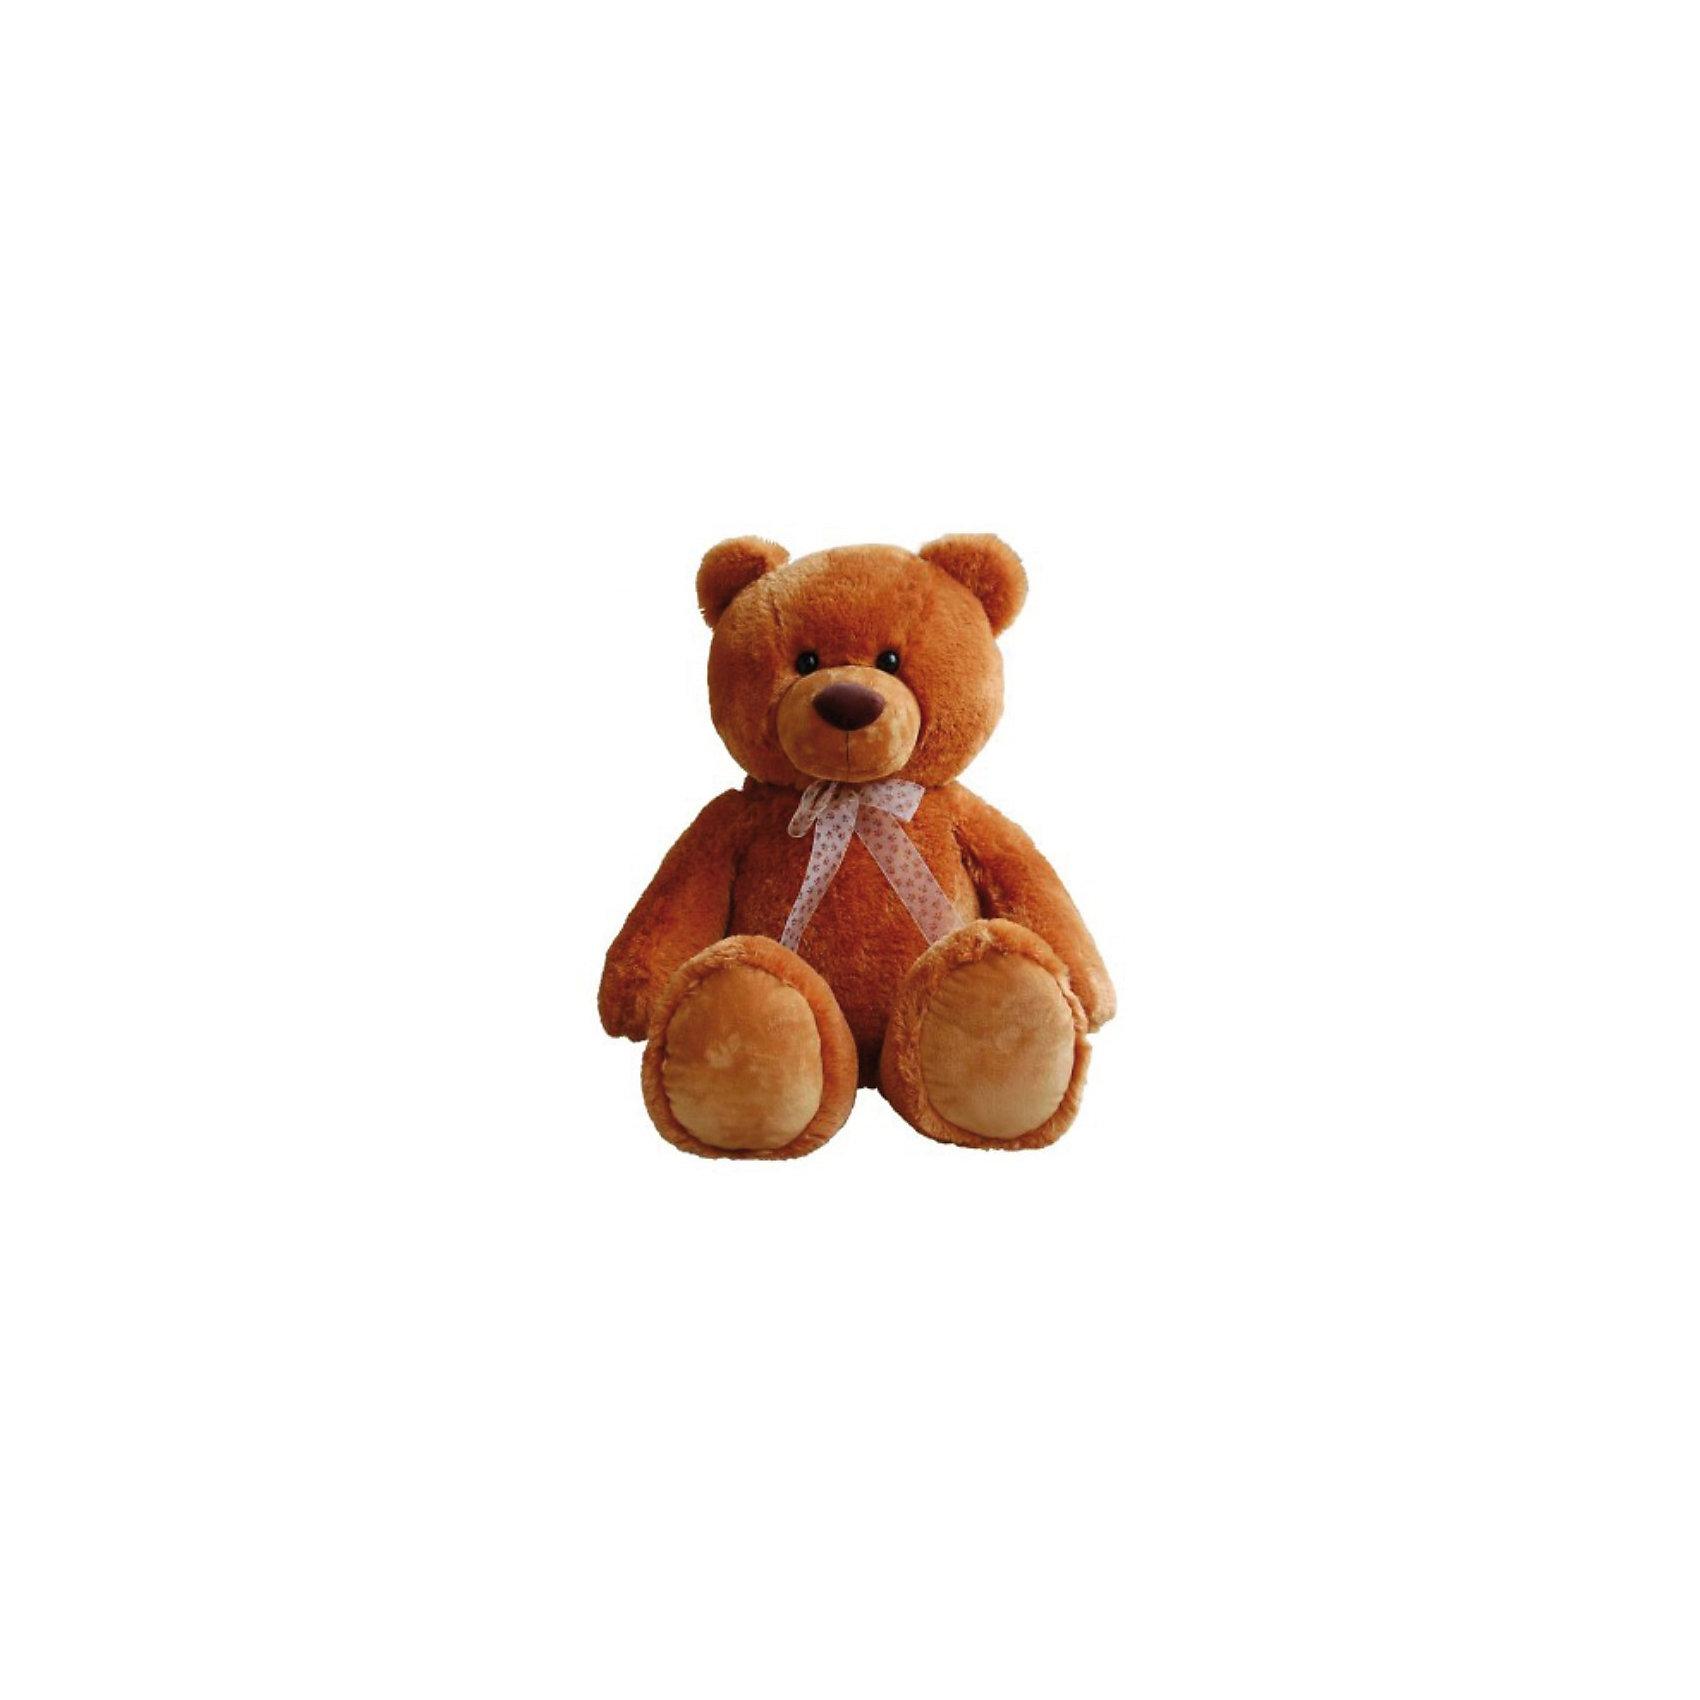 AURORA AURORA Мягкая игрушка Медведь сидячий (коричневый), 80 см fqp7n80c to220 7a800v 7n80